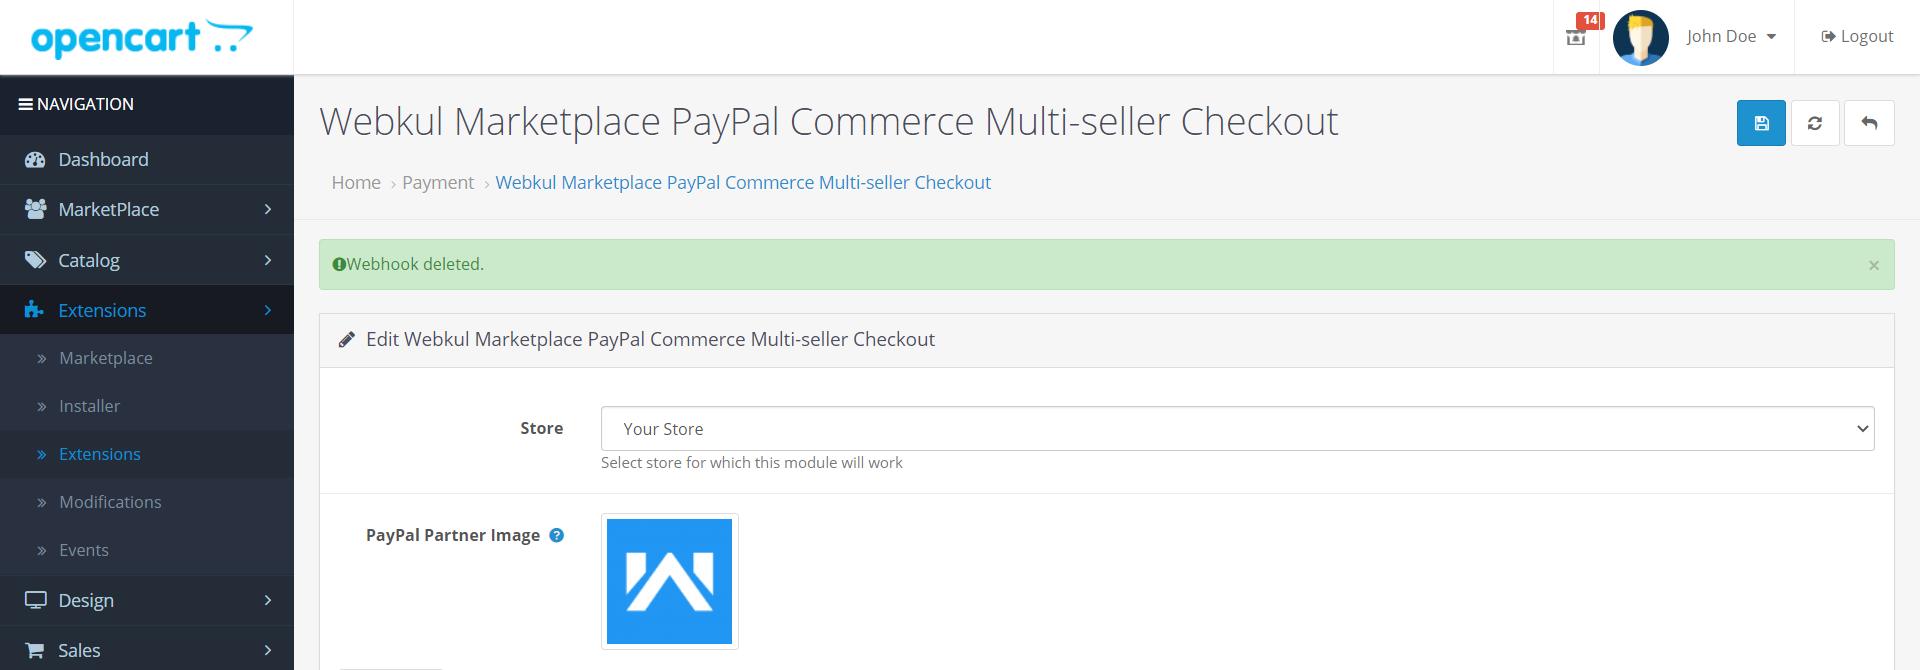 Webkul-Marketplace-PayPal-Commerce-Multi-seller-Delete-webhook